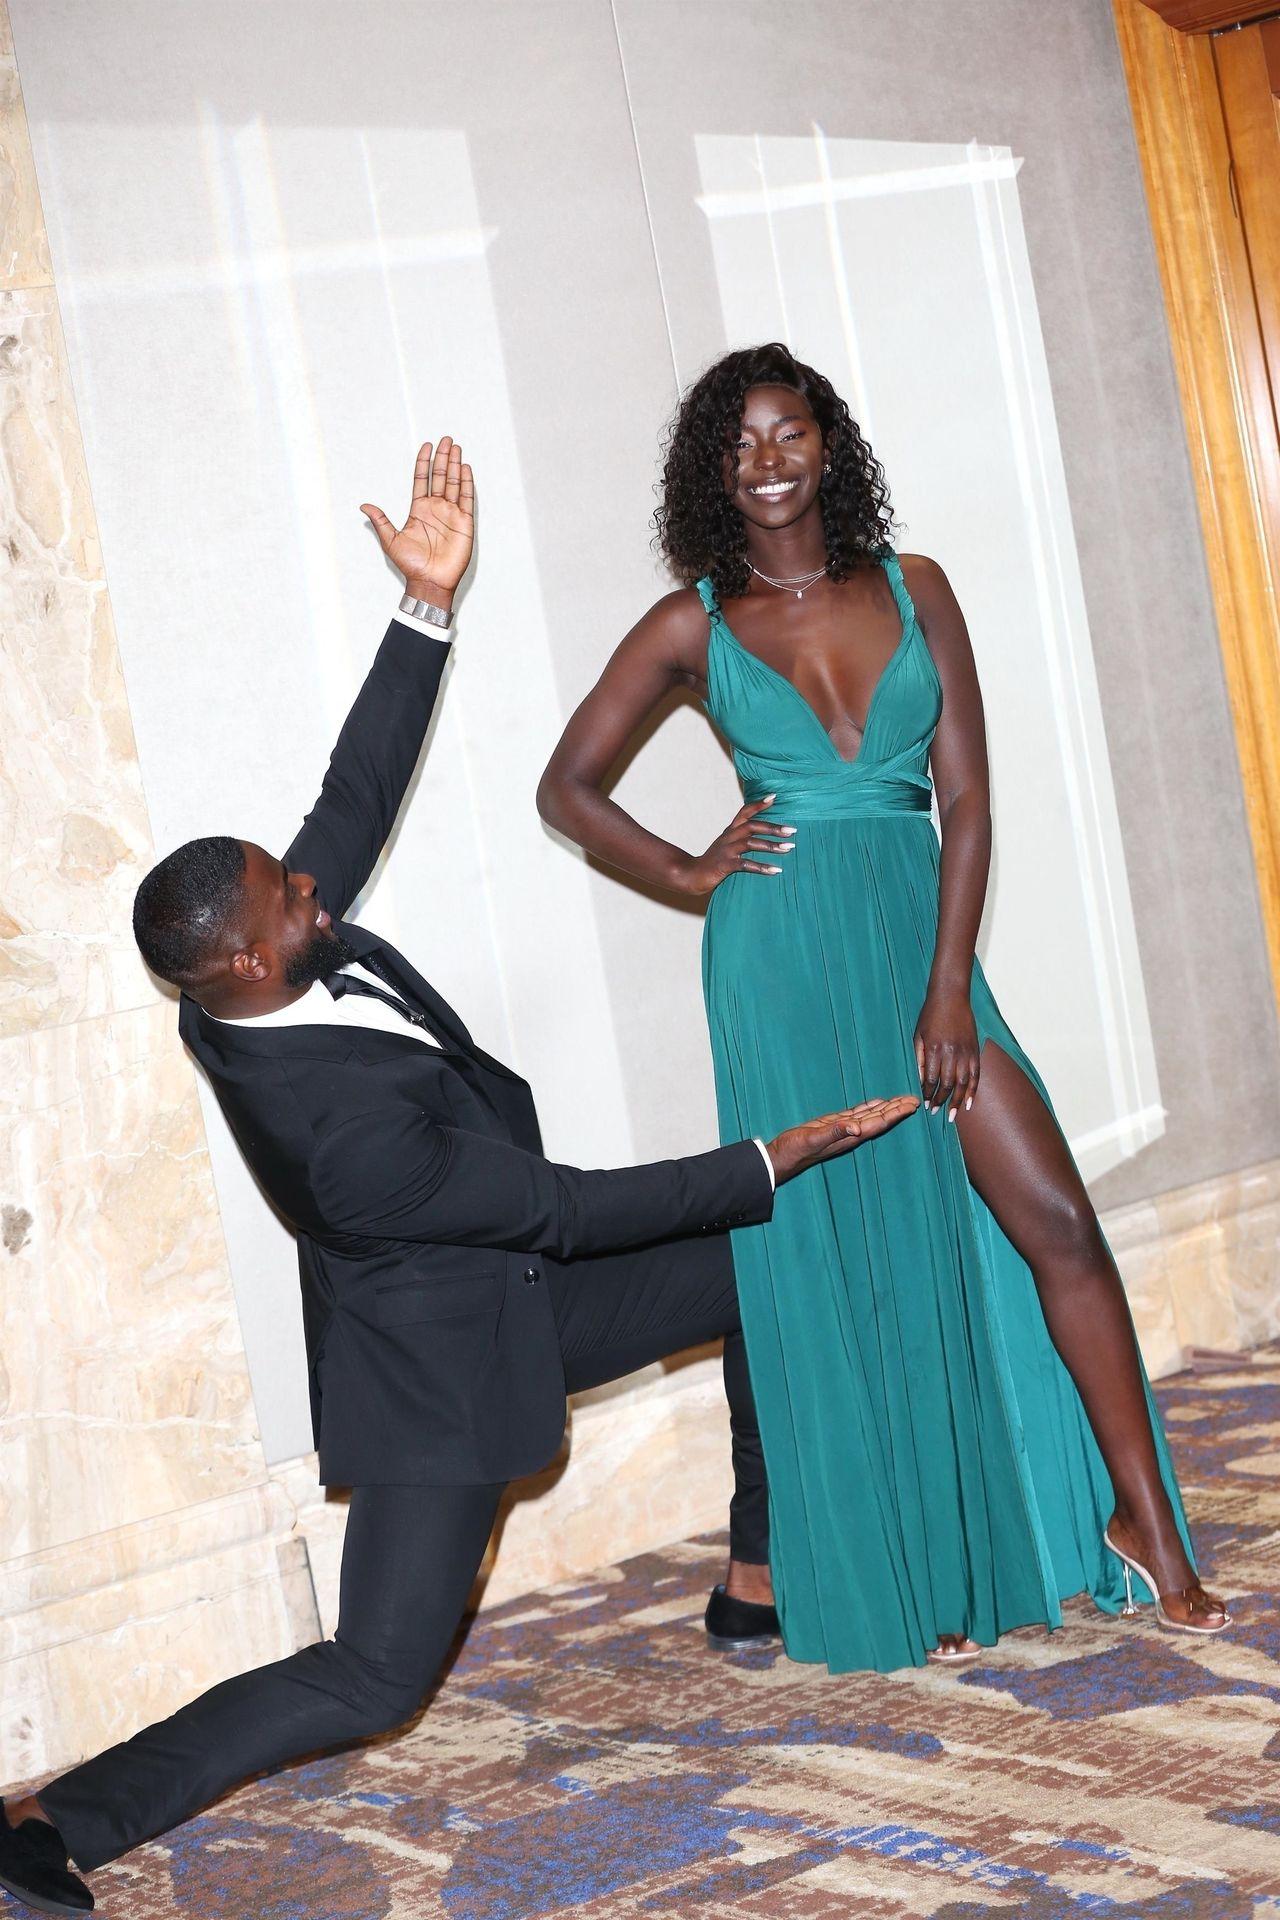 Mike Boateng & Priscilla Anyabu Are Seen At British Ethnic Diversity Sports Awards 0138